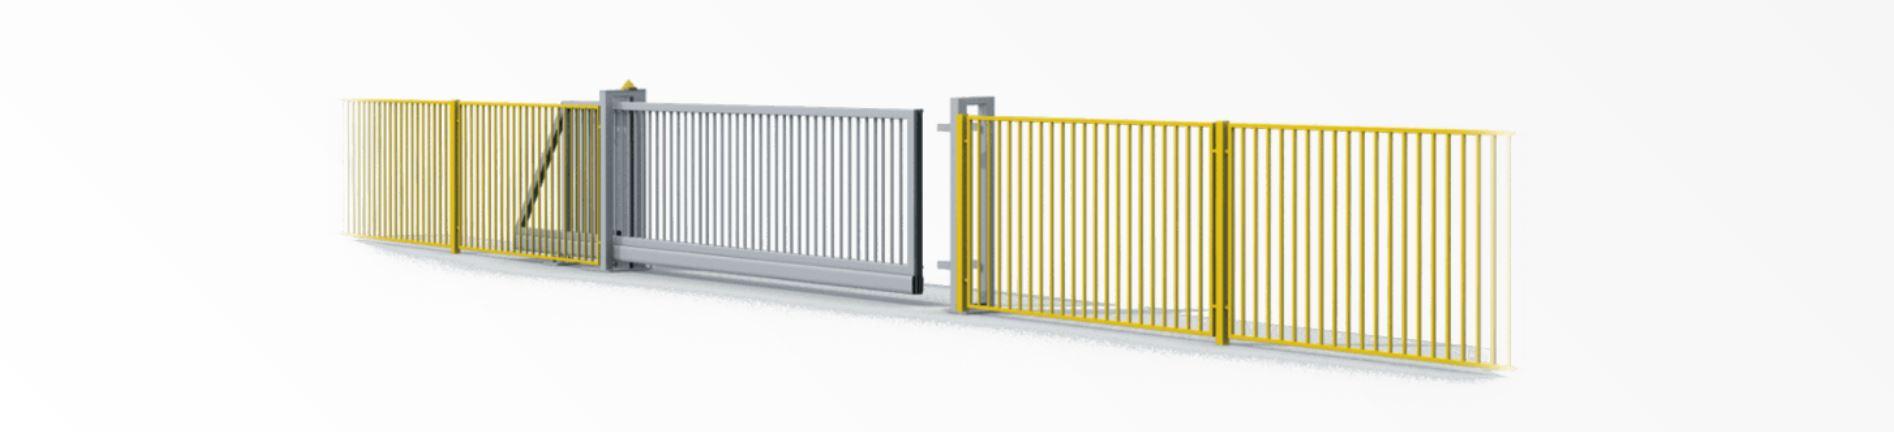 poarta industriala autoportanta cu gard metalic industrial realizat de smilo holding